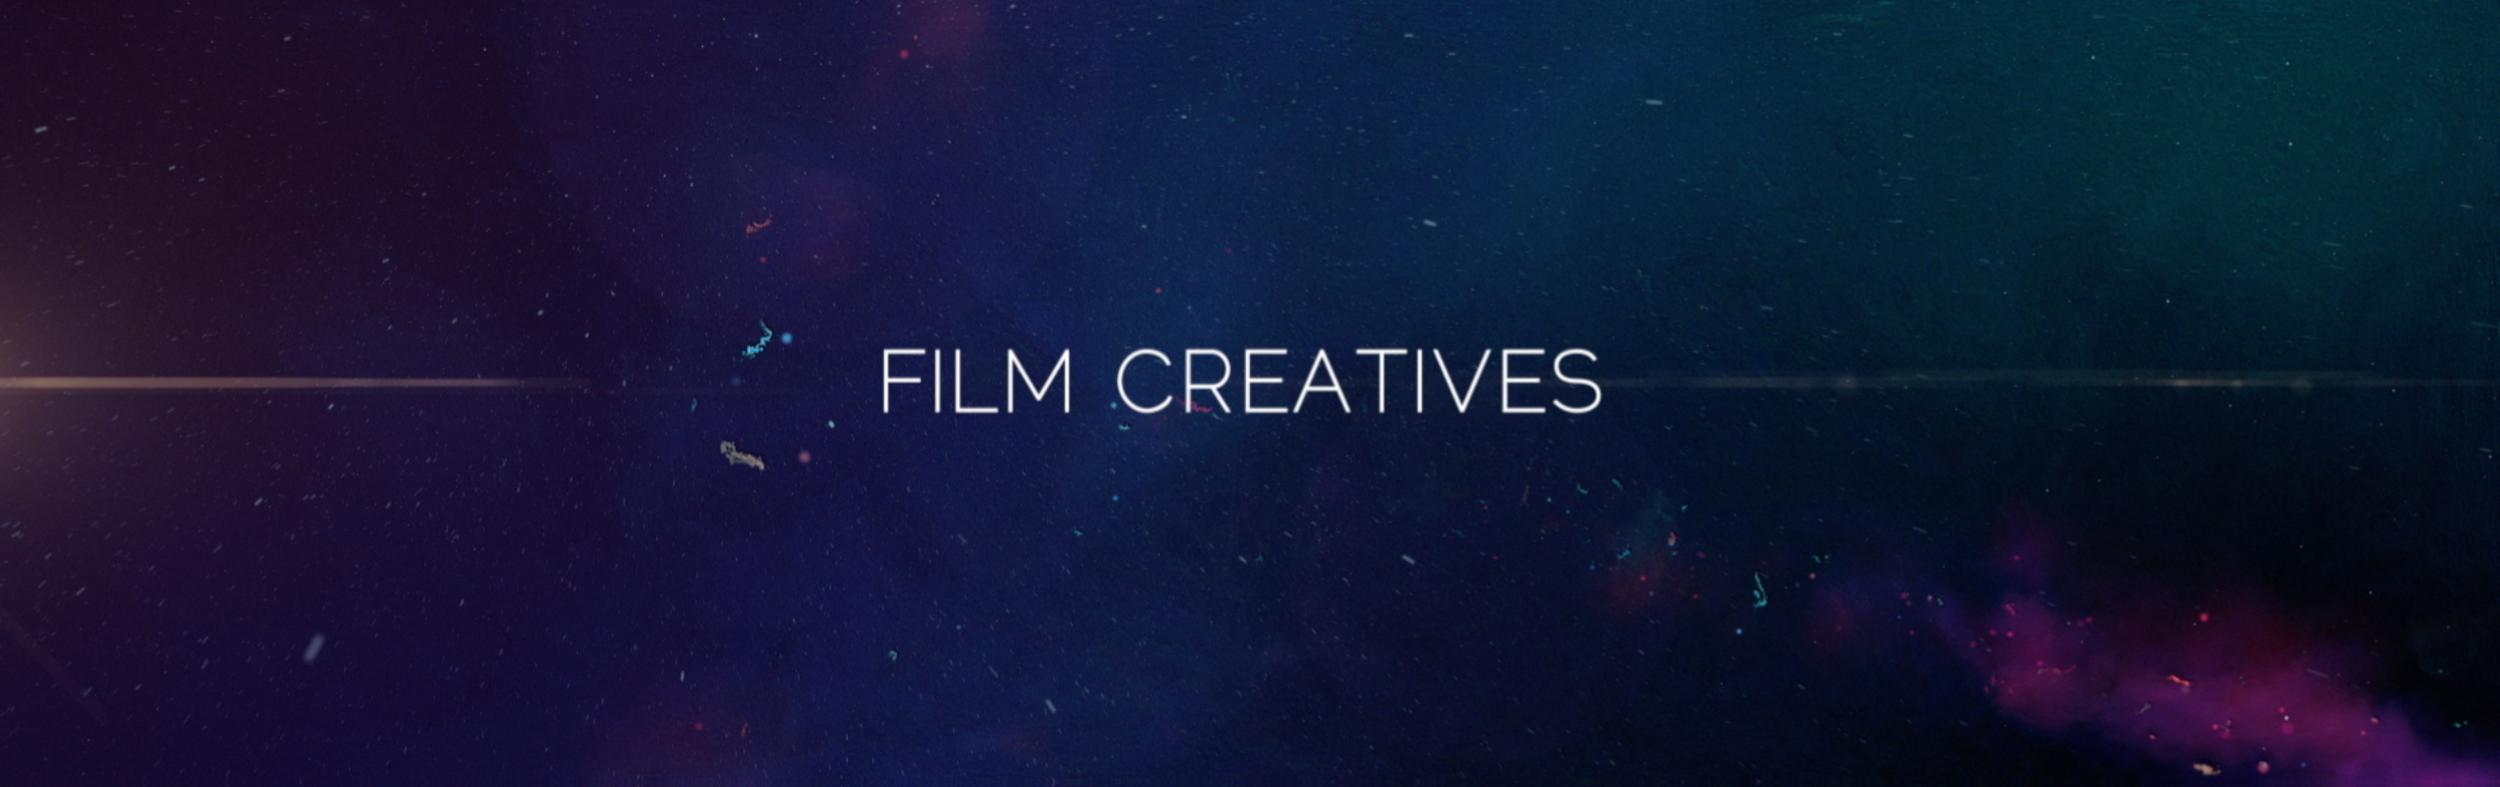 Film Creatives Showreel (2014)